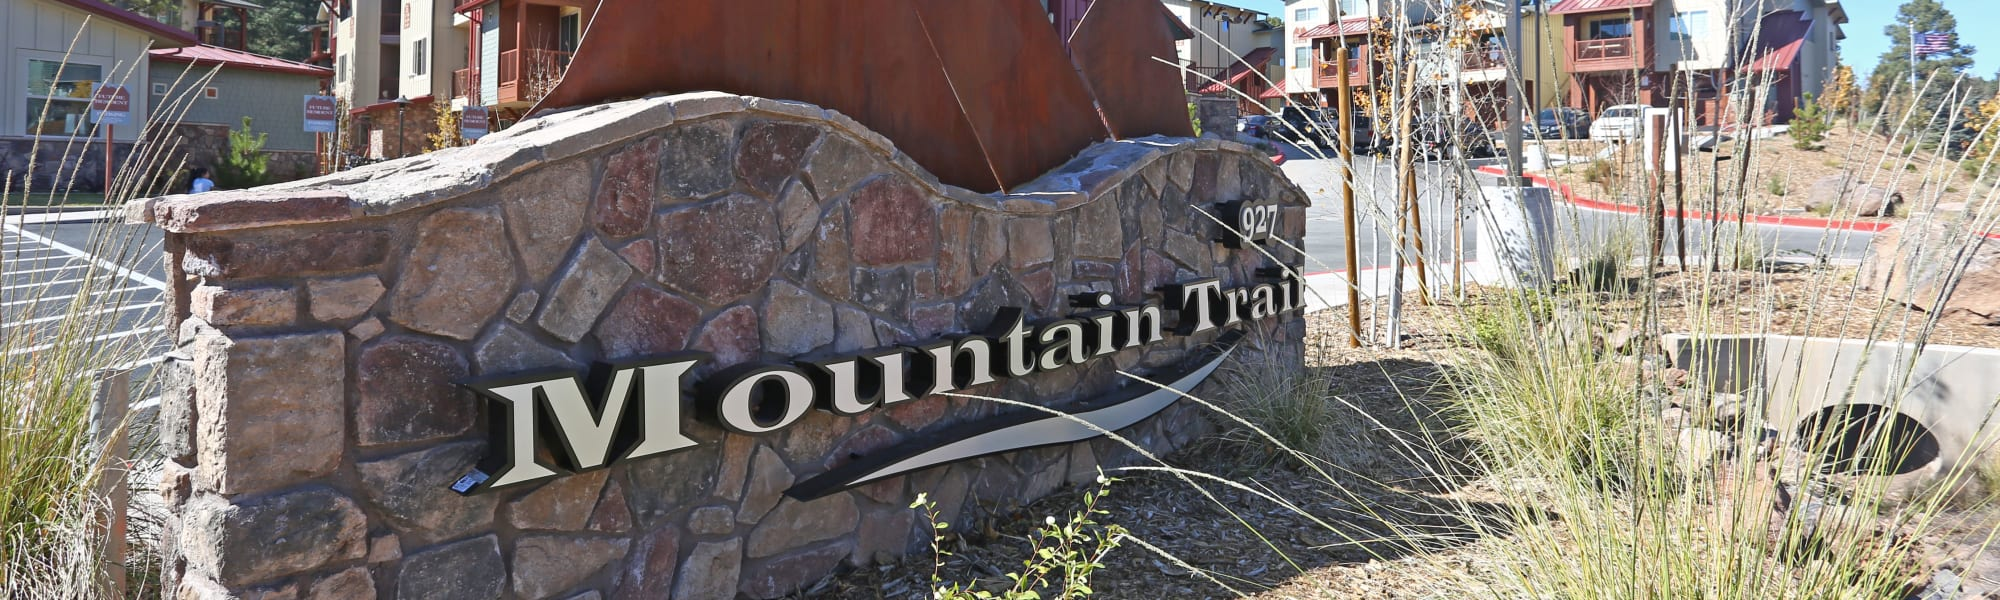 Reviews of Mountain Trail in Flagstaff, Arizona